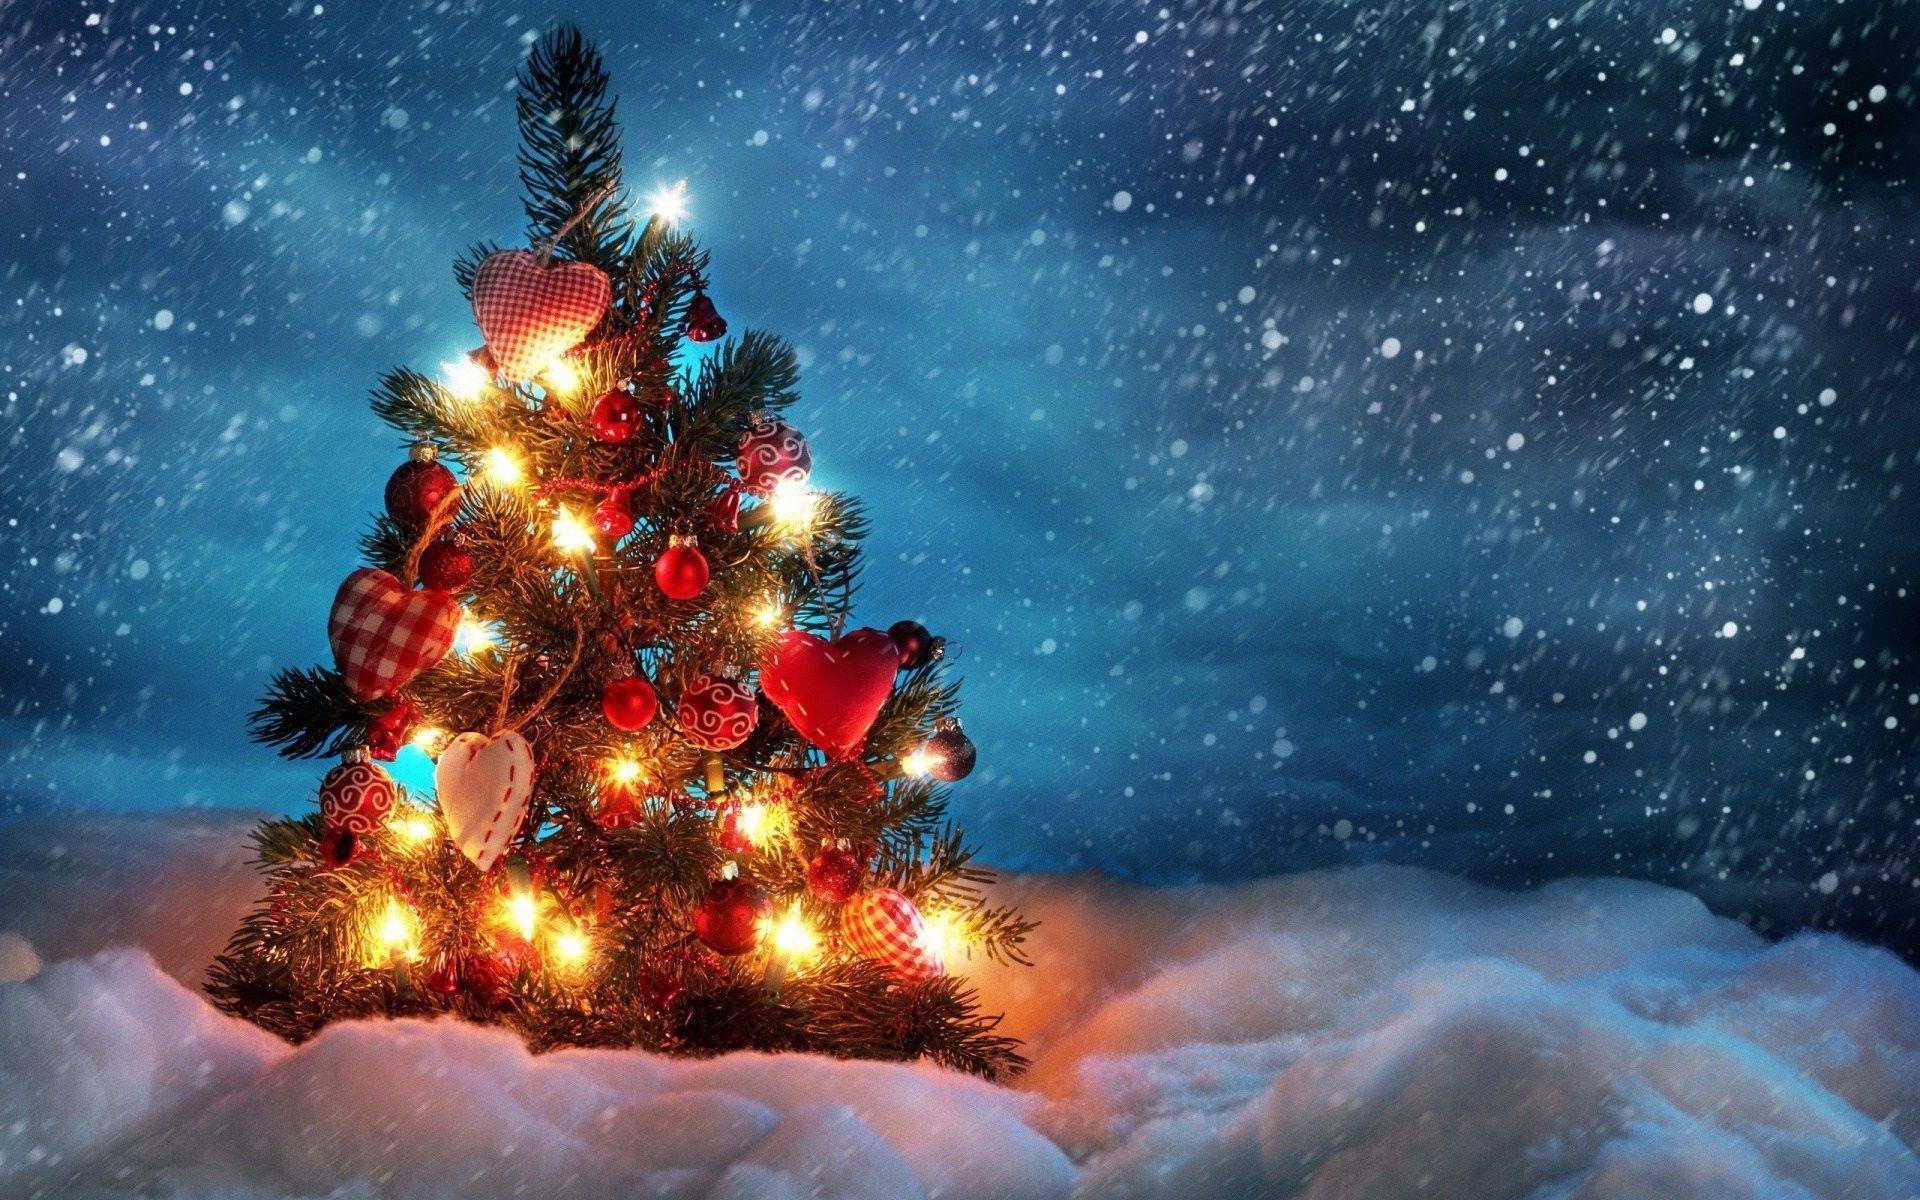 Winter Christmas Backgrounds Wallpapers9 Christmas Tree Wallpaper Christmas Desktop Wallpaper Christmas Desktop